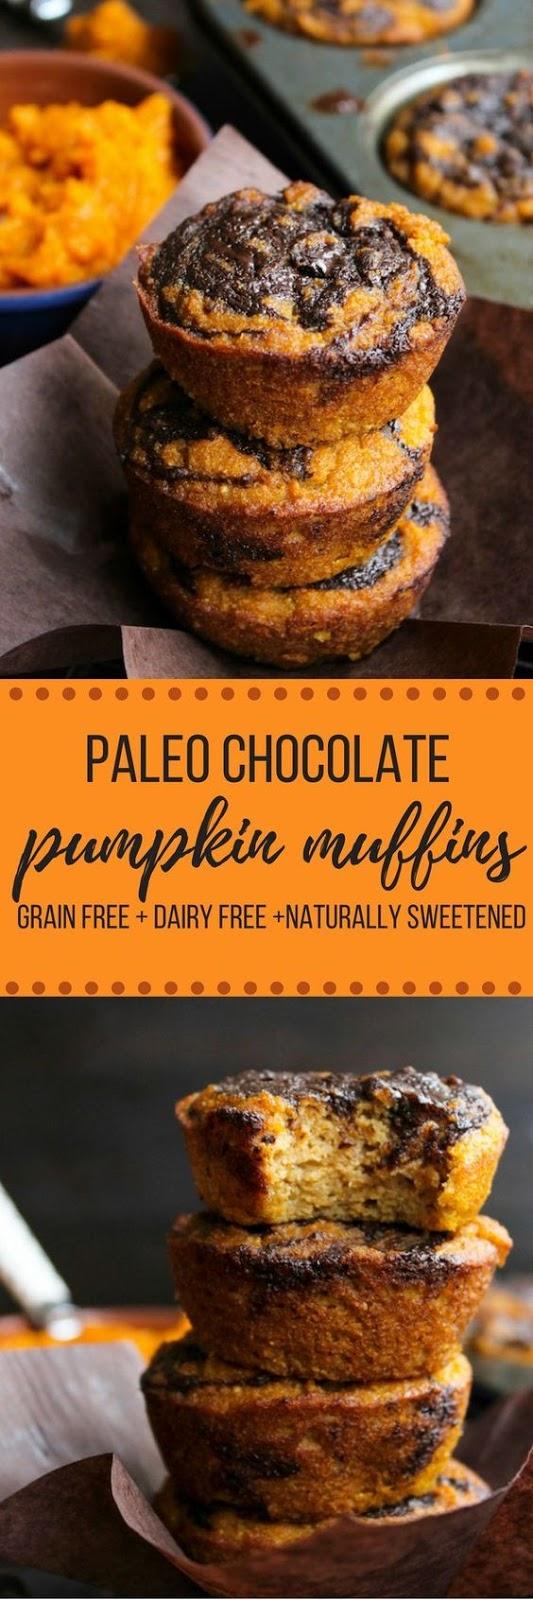 PALEO PUMPKIN MUFFINS WITH A CHOCOLATE SWIRL